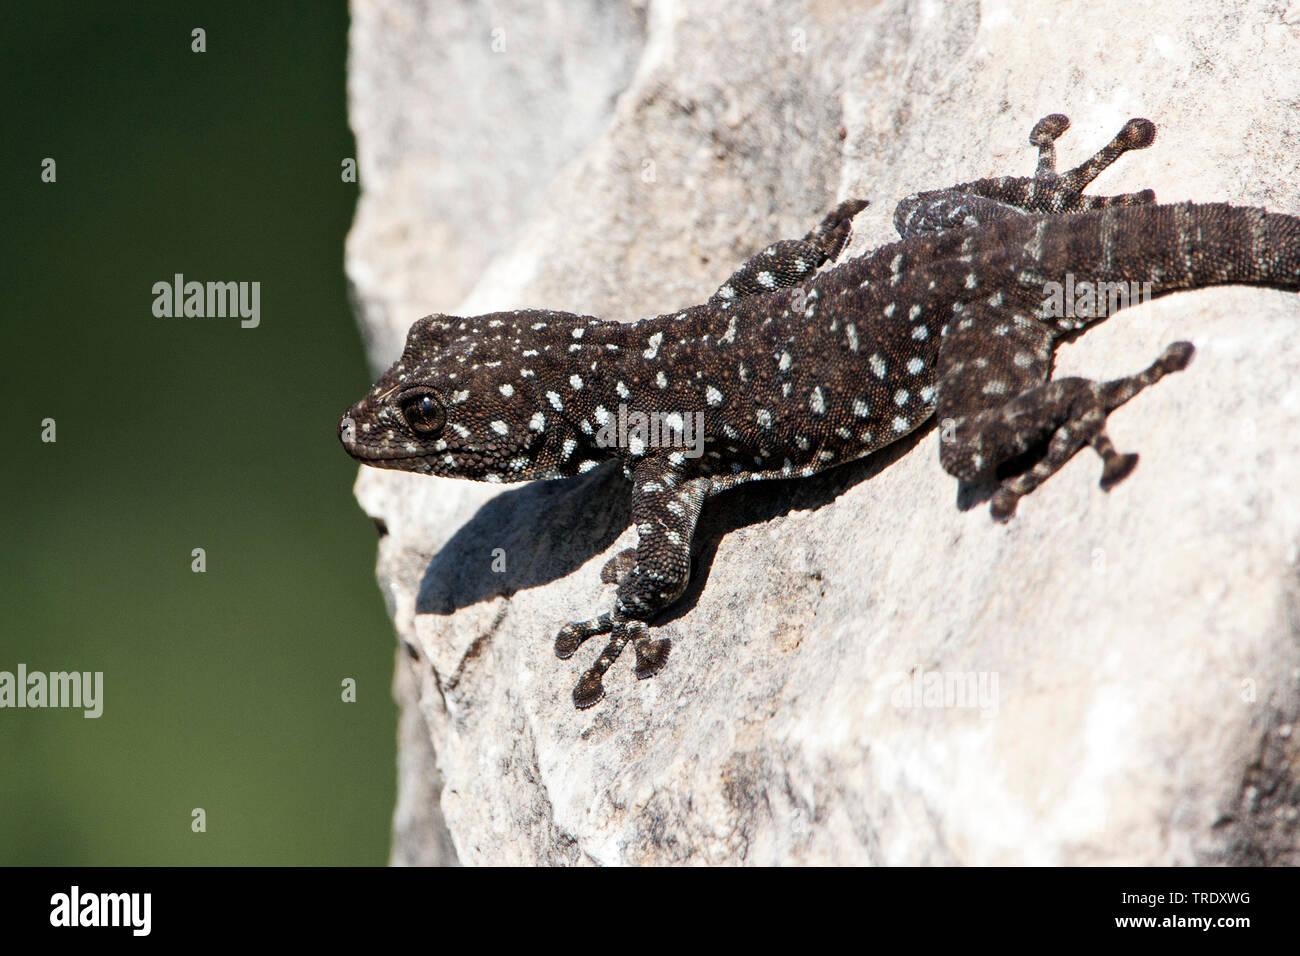 Fan-fingered Gecko (Ptyodactylus puiseuxi), sitting on a rock, Israel Stock Photo